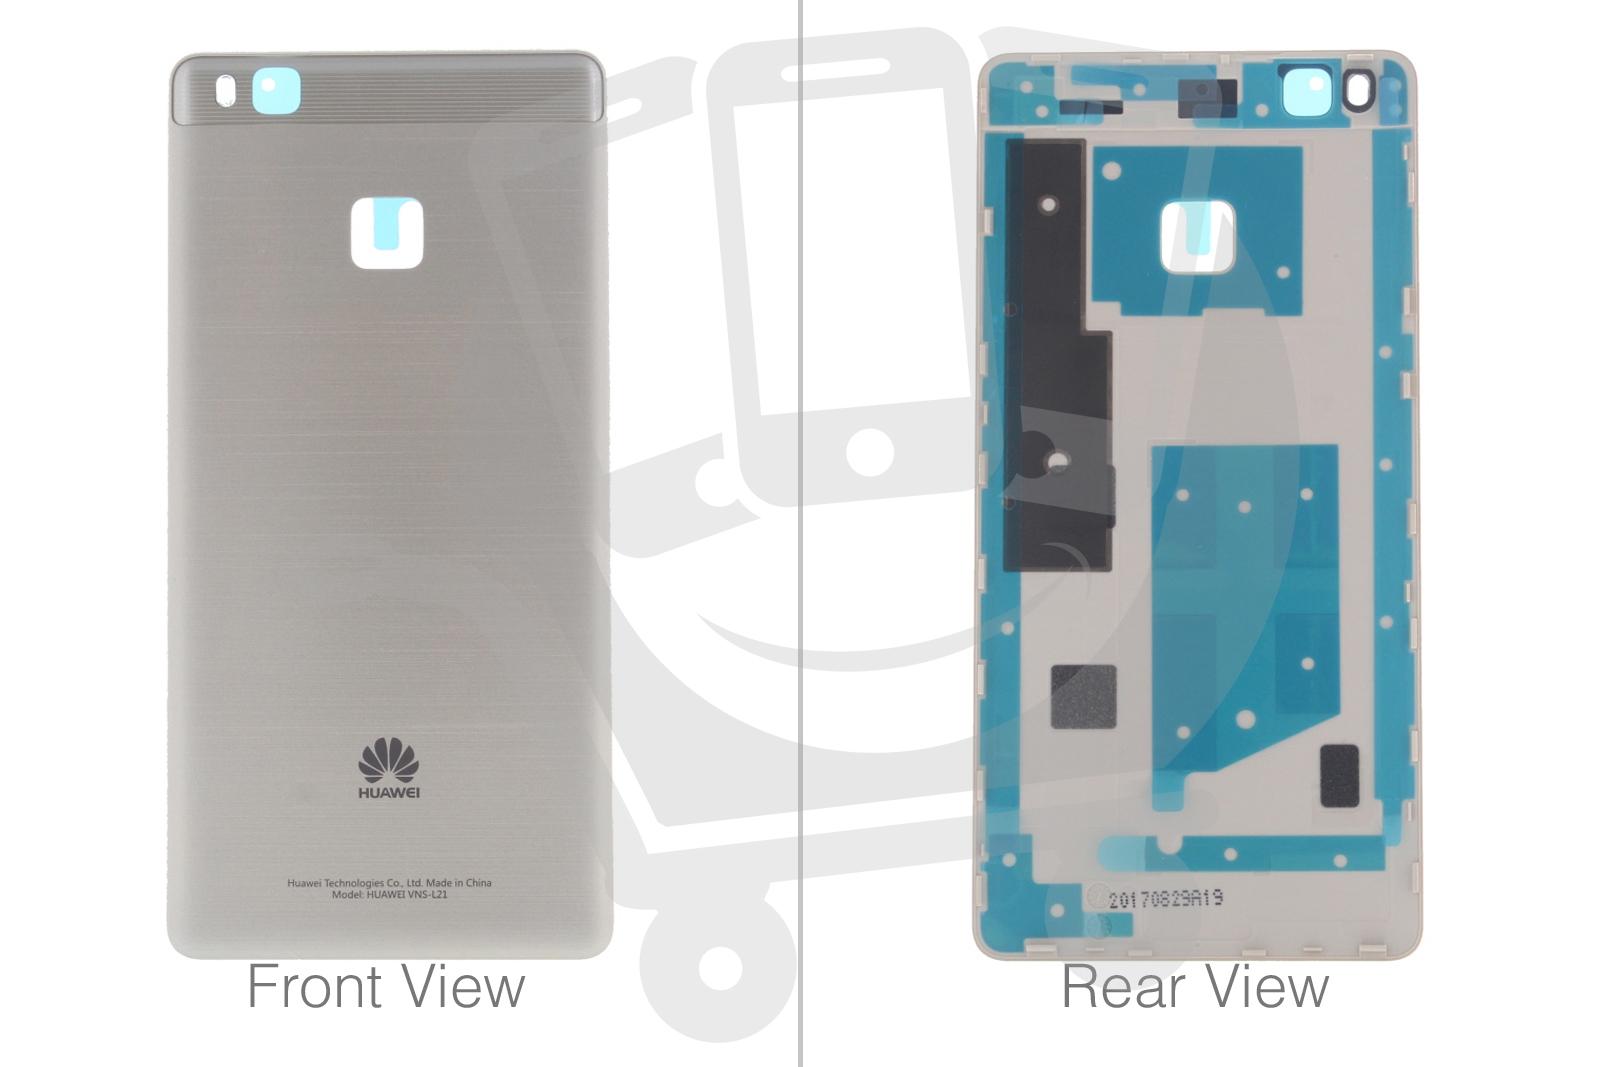 Genuine Huawei P9 Lite VNS-L31 Gold Battery Cover - 02350SCQ | eBay